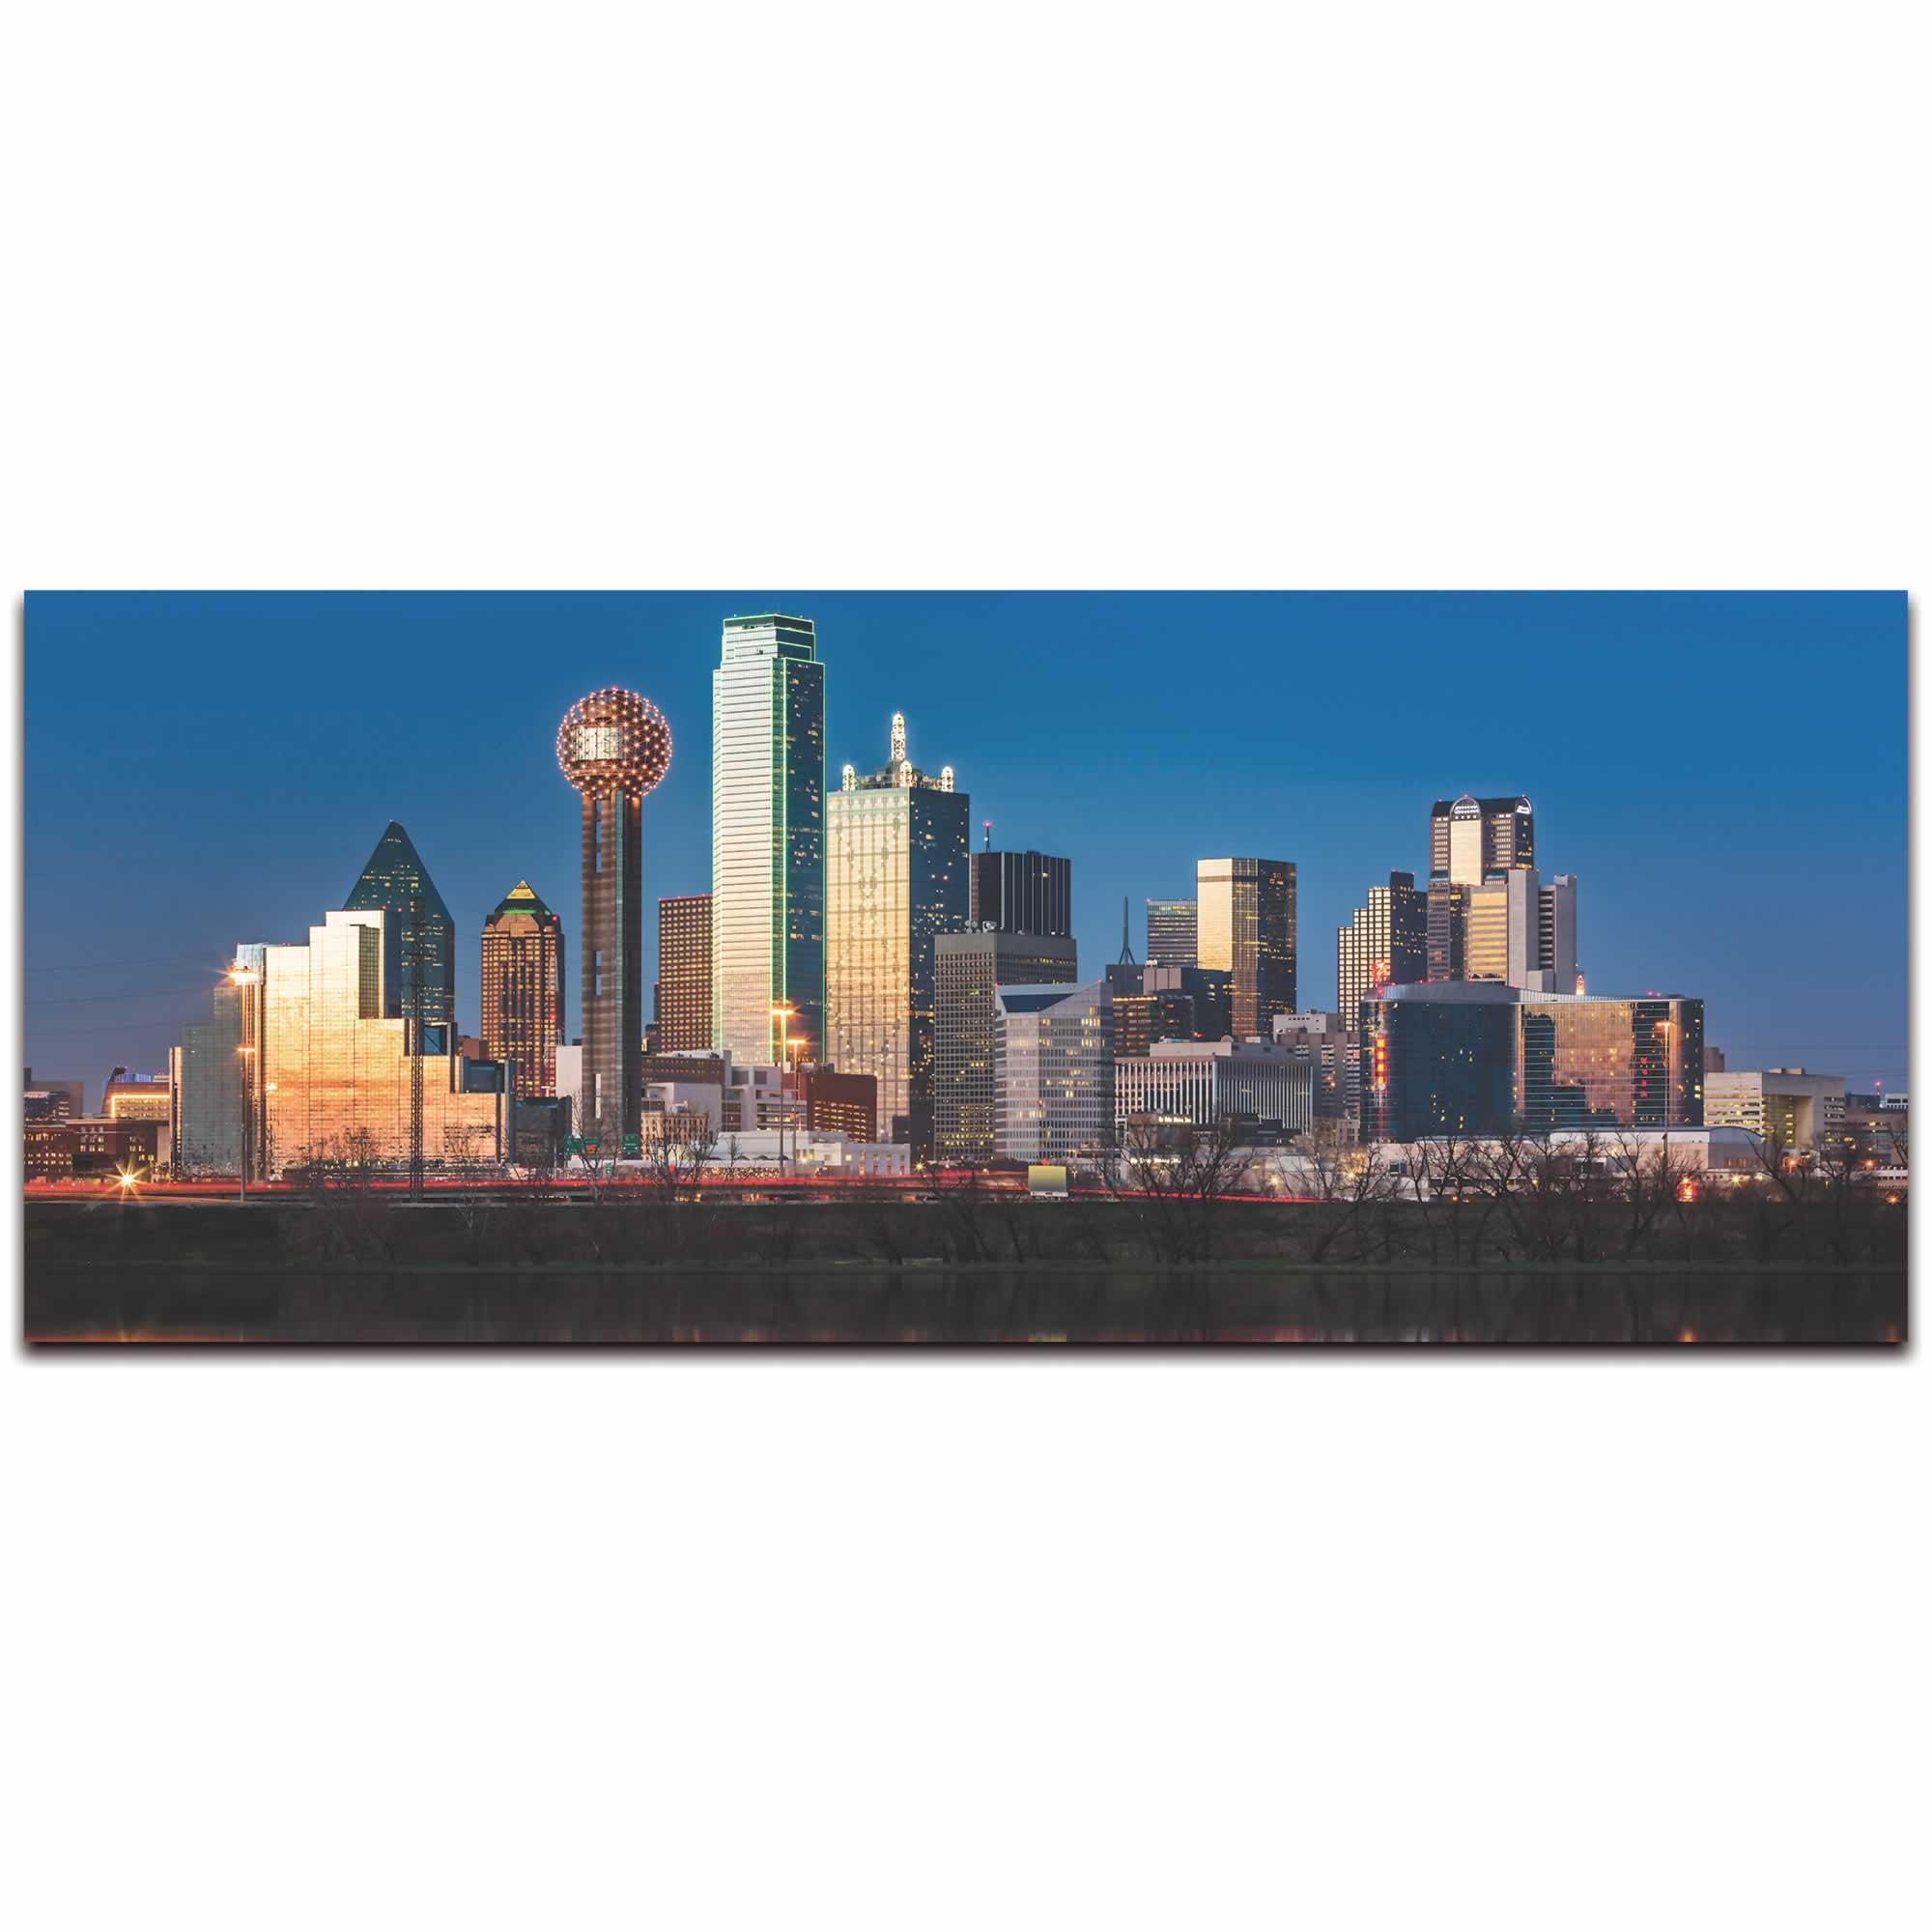 Dallas City Skyline - Urban Modern Art, Designer Home Decor, Cityscape Wall Artwork, Trendy Contemporary Art - Alternate View 2